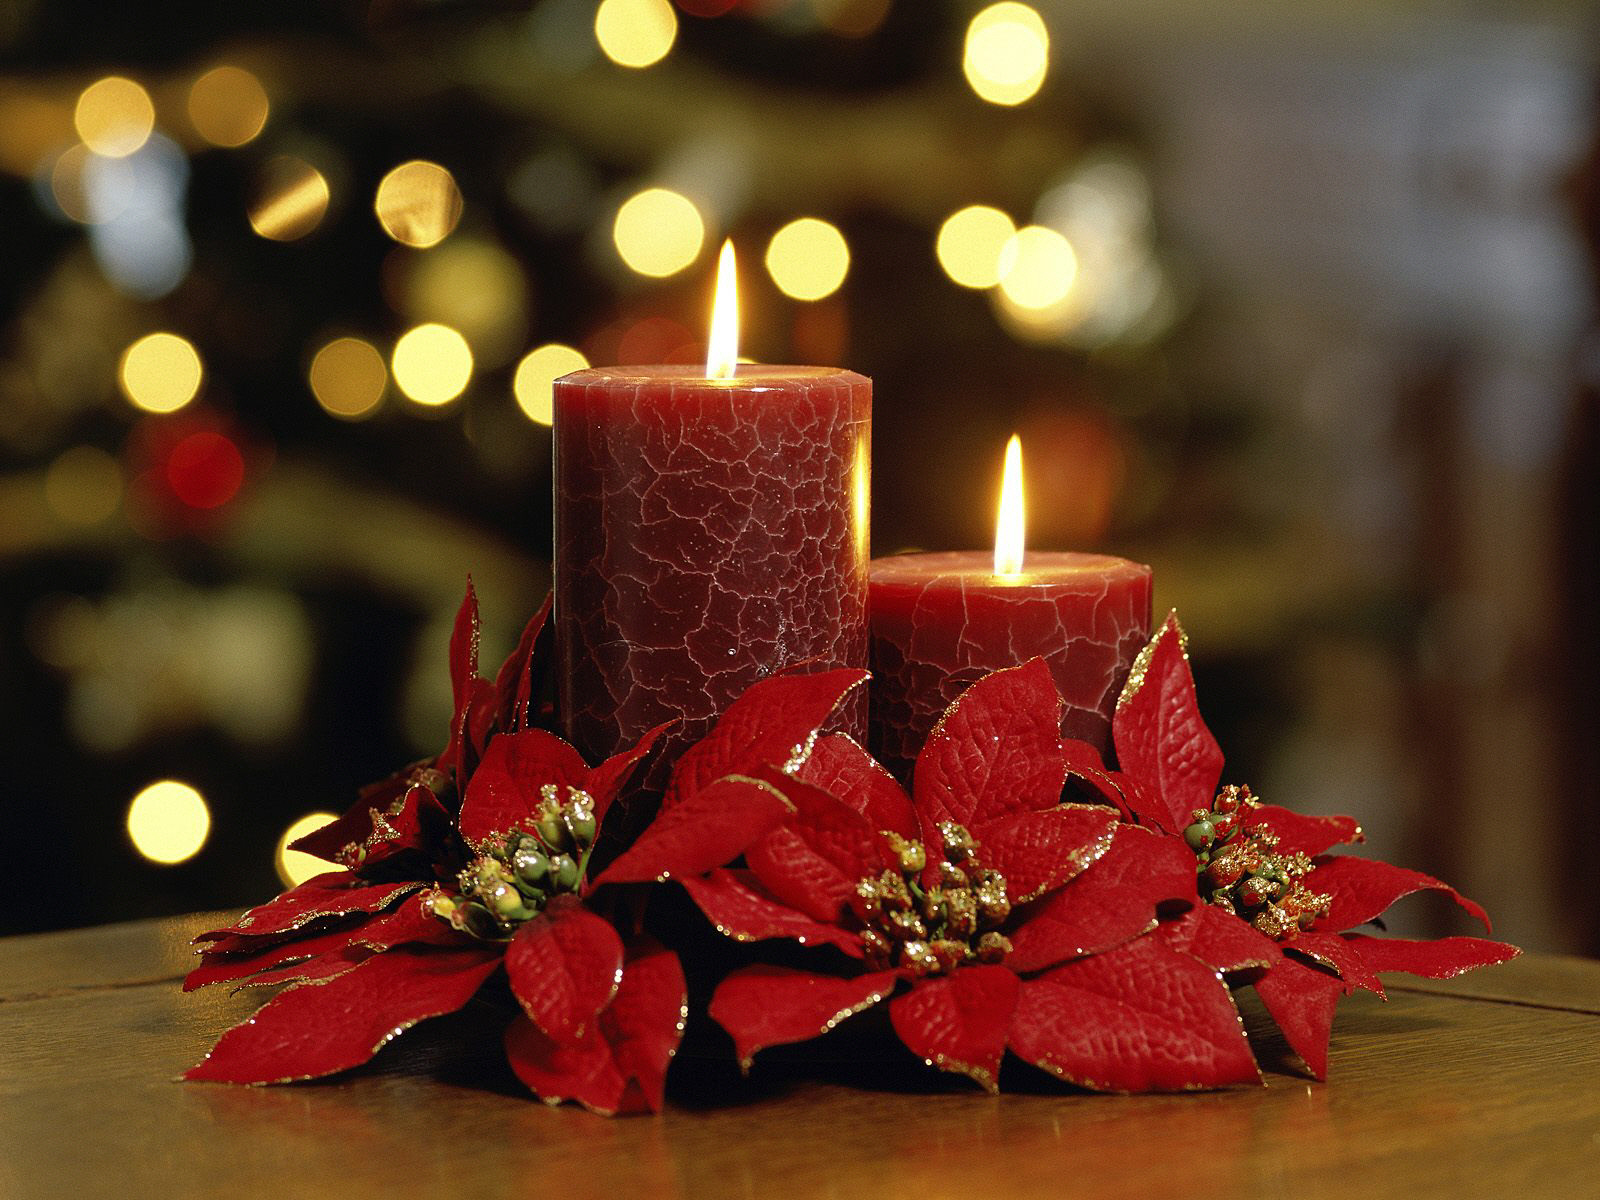 merry christmas jingle bells wallpaper 254 Views